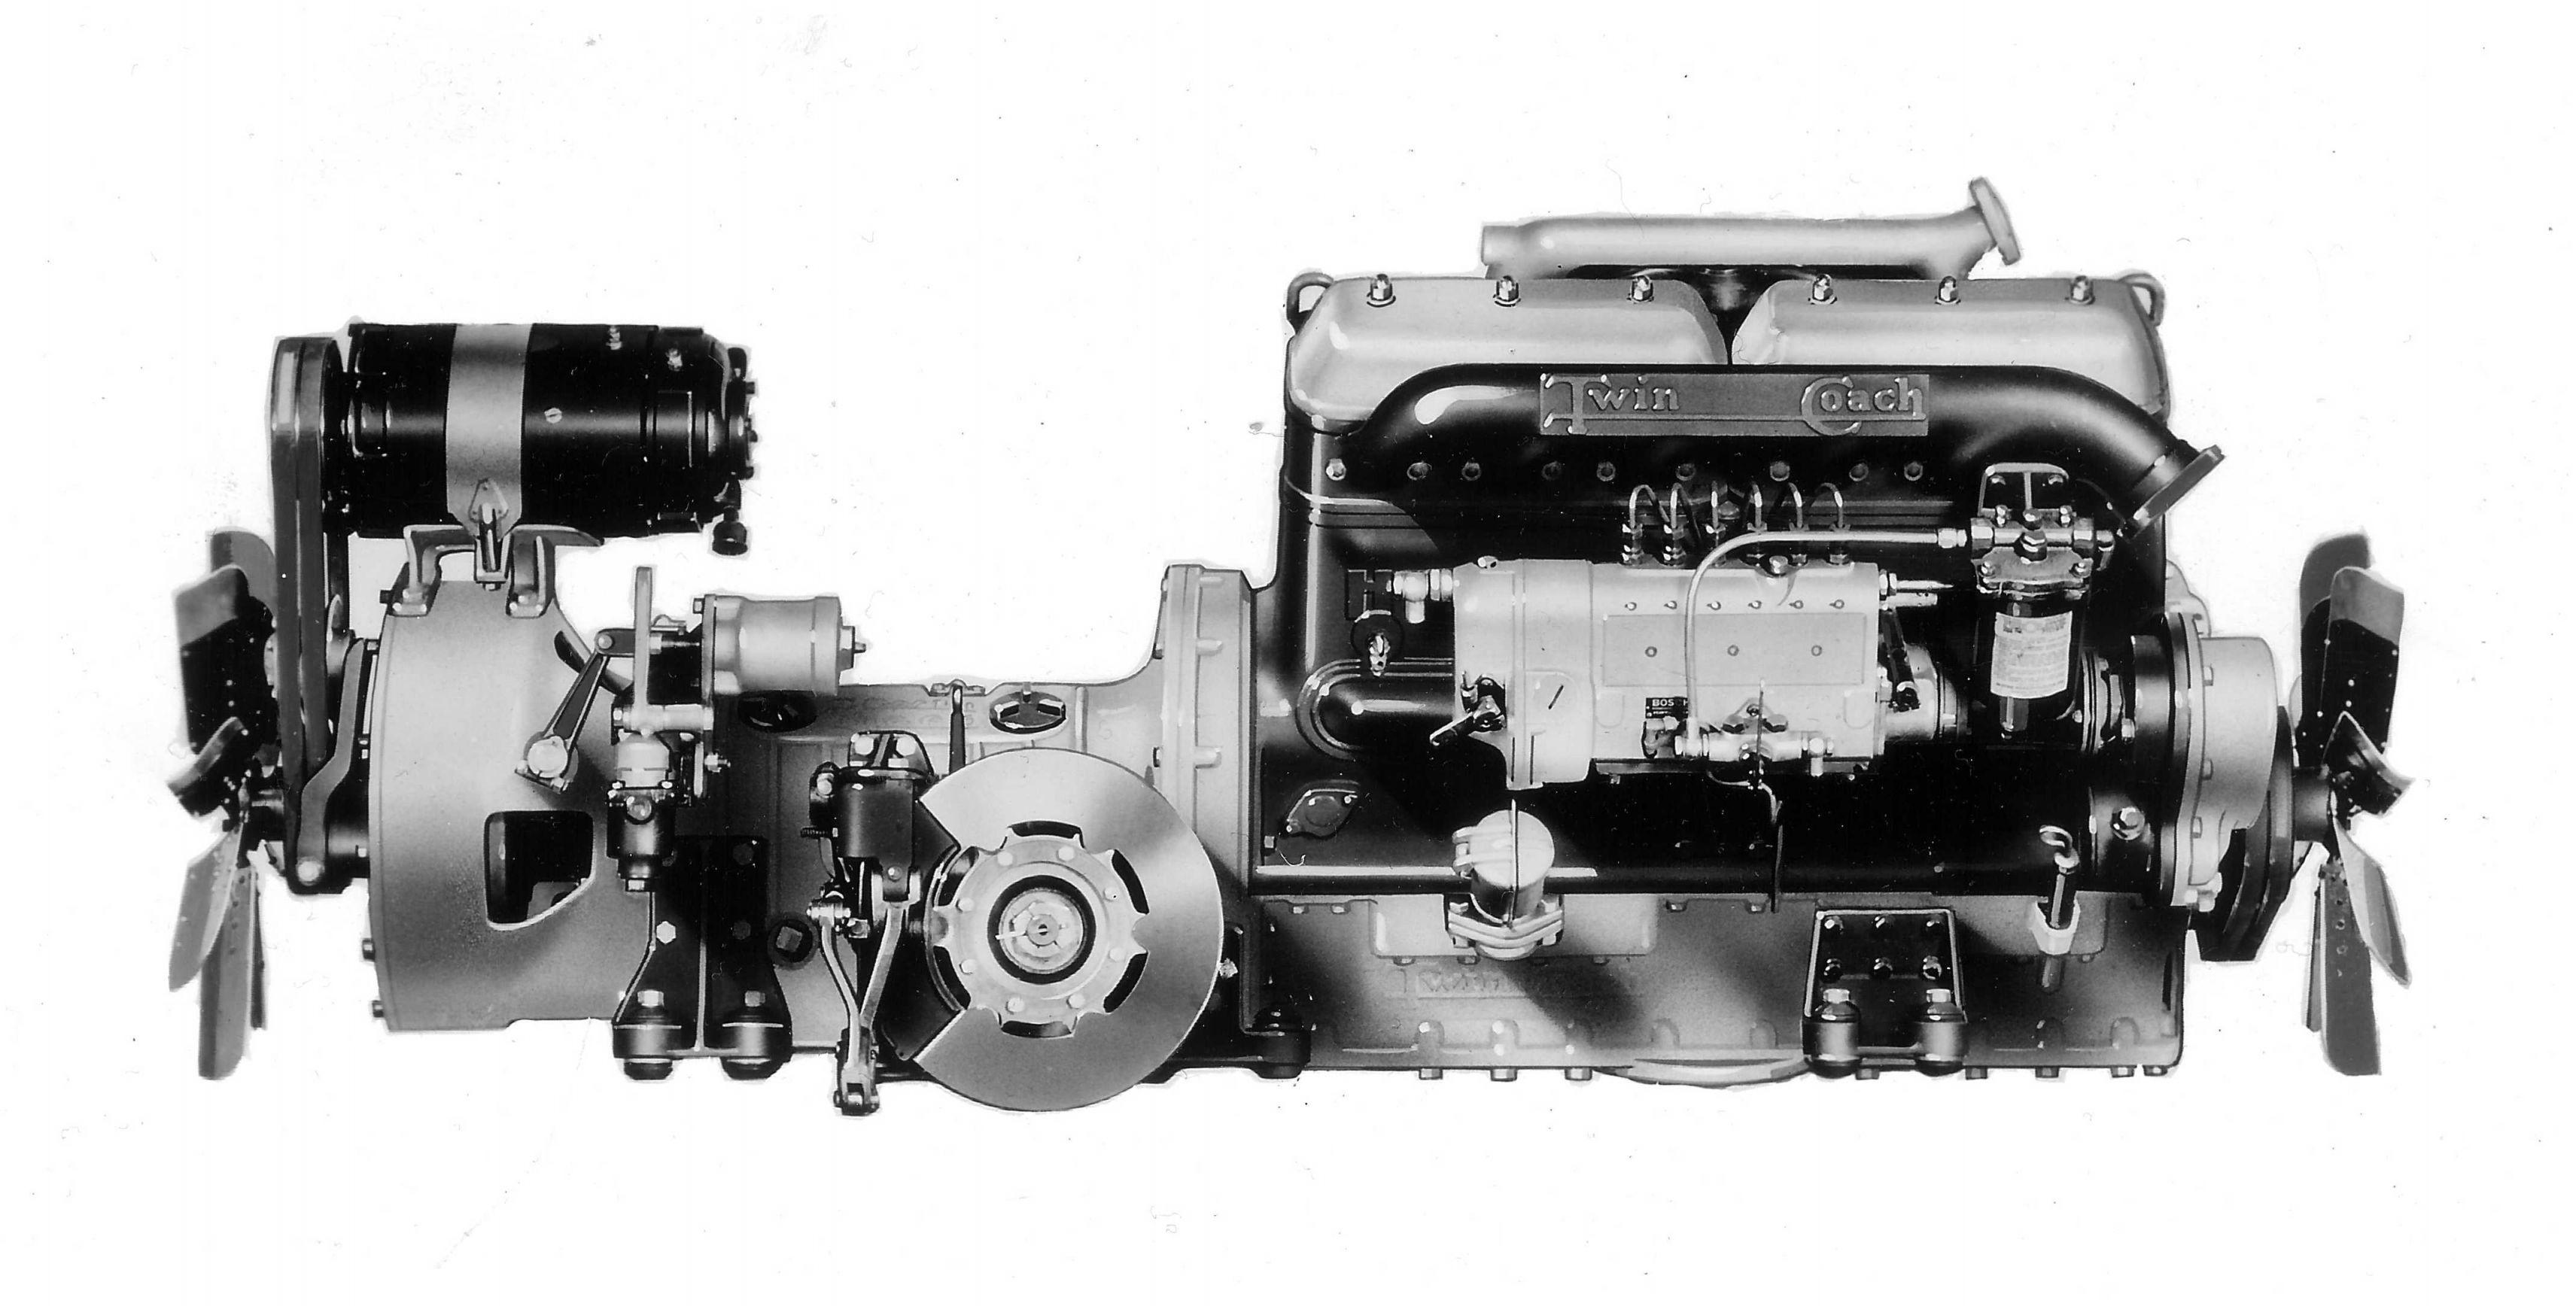 Cdl Pre Trip Inspection Diagram Cdl Engine Compartment Diagram Finest Pre Trip Inspection Engine